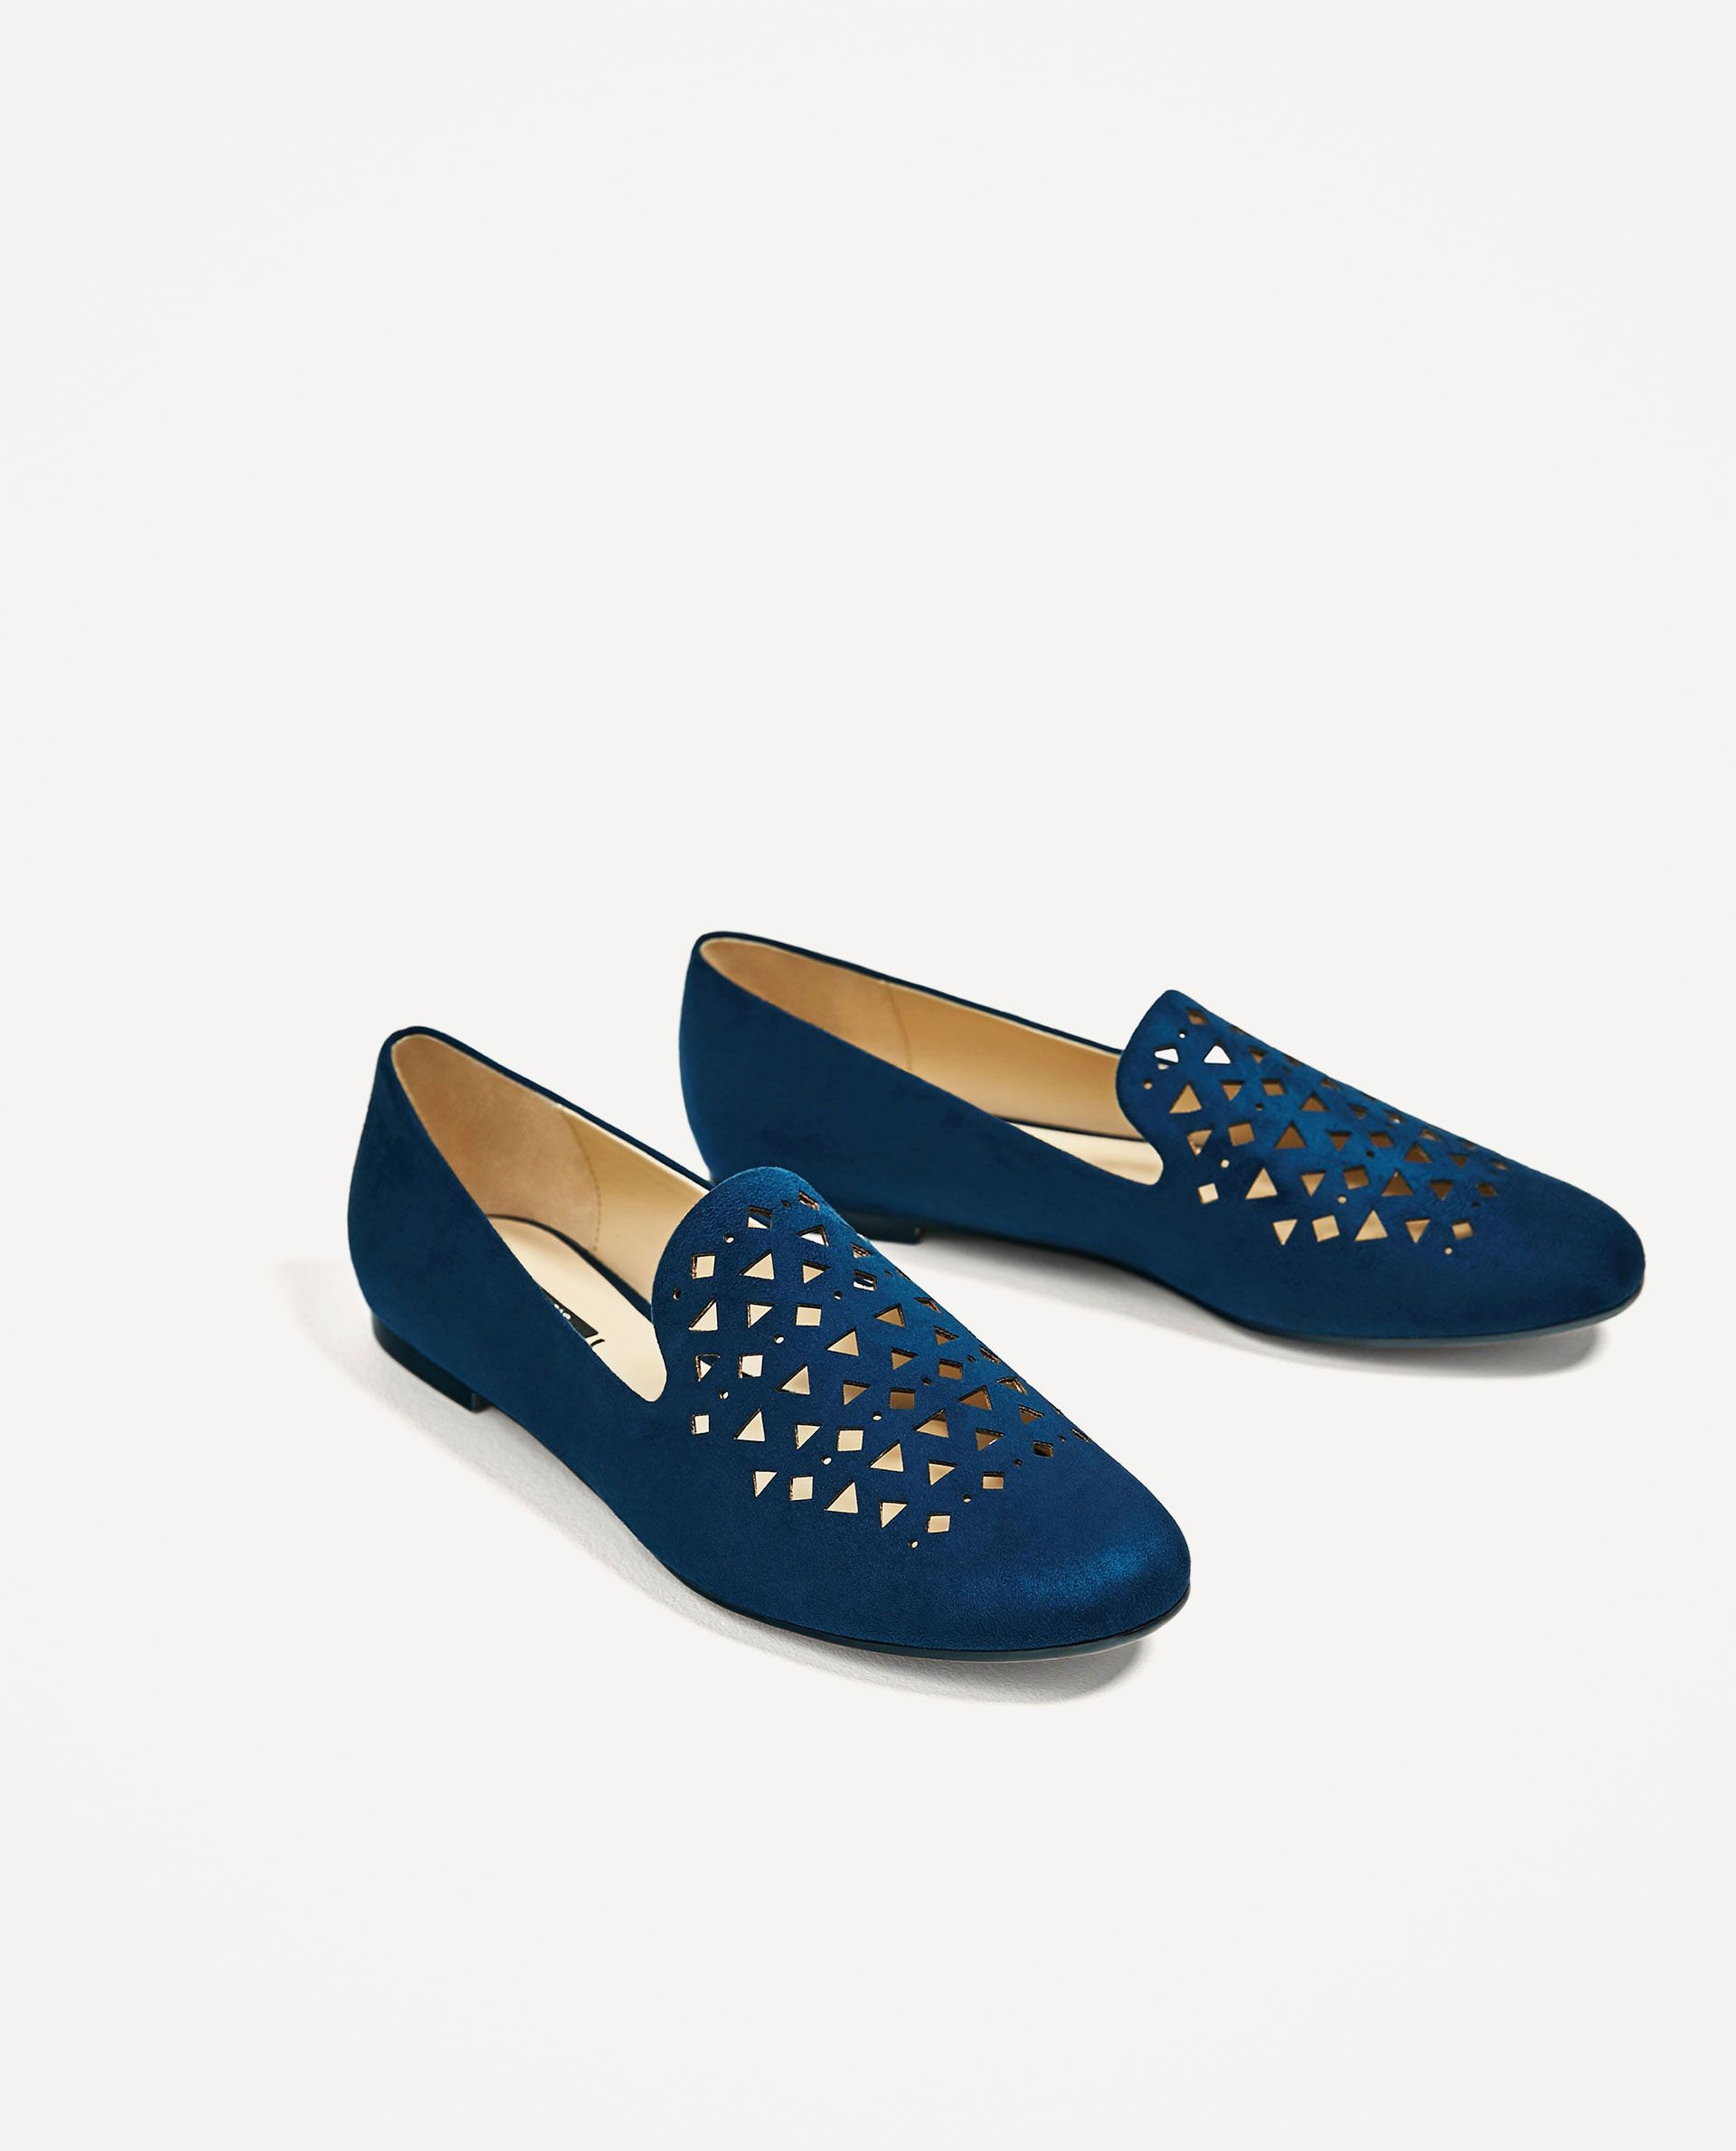 Zara Woman Flat Shoes With Cutwork Detail Flache Schuhe Damen Bequeme Schuhe Coole Schuhe